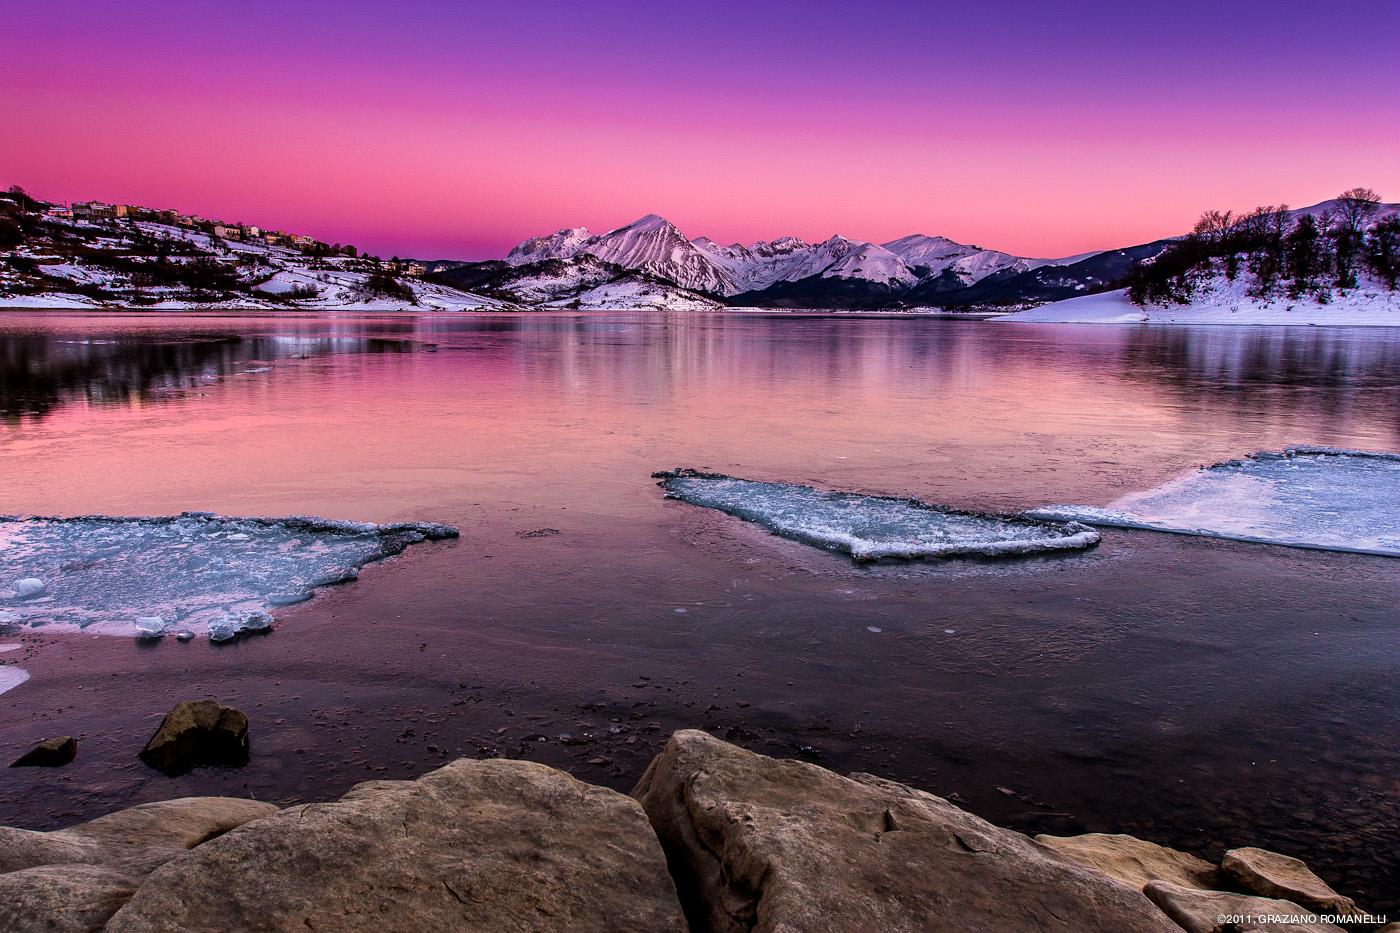 Sunset on the frozen lake Campotosto. - Graziano ...